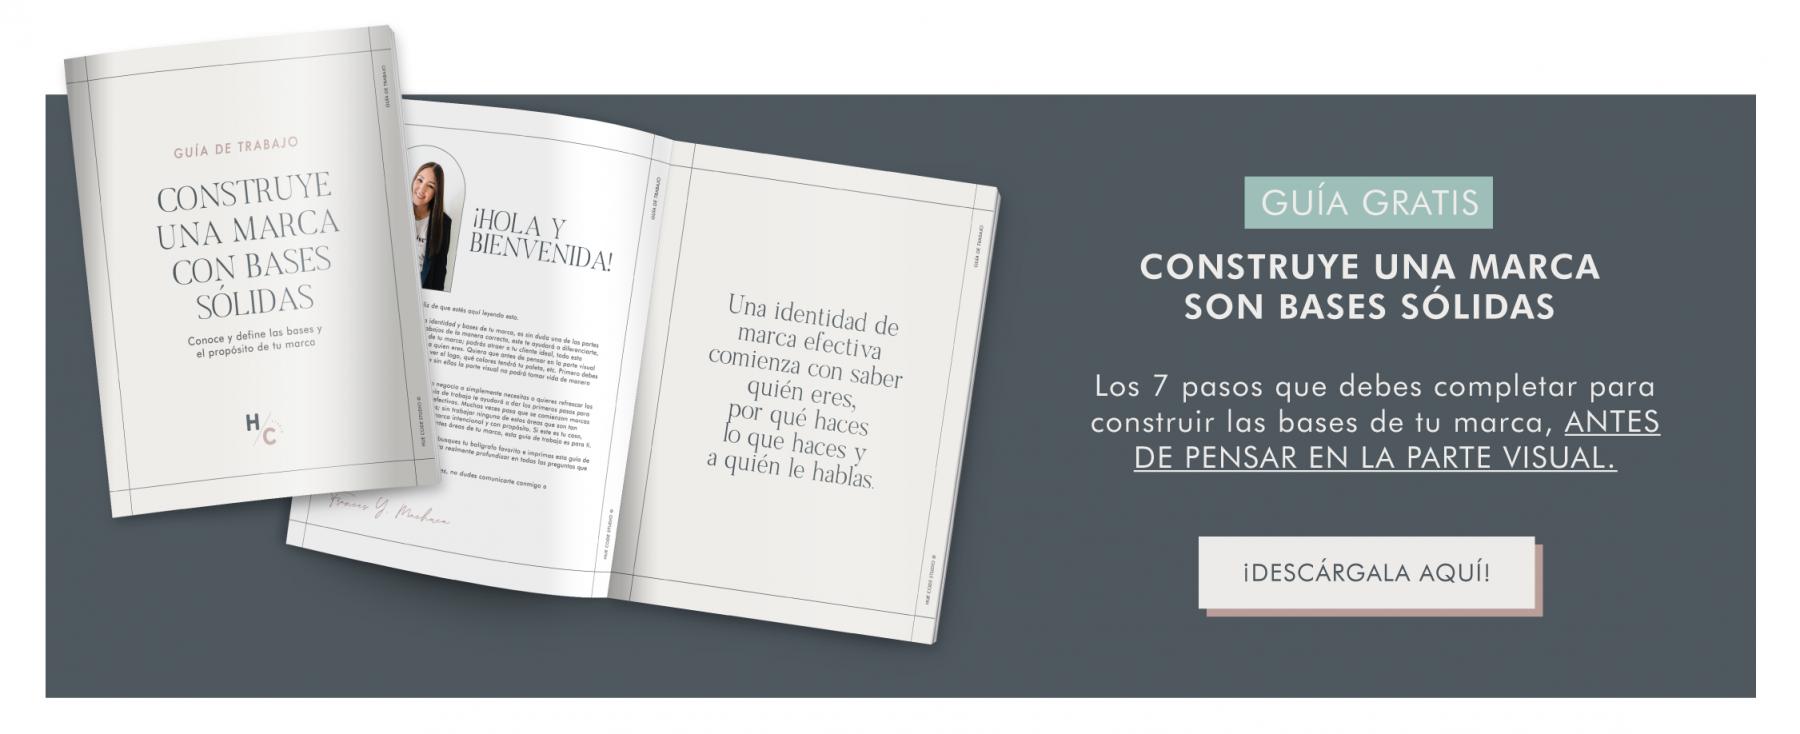 Banner-Descargar-Guia-ConstruyeMarca